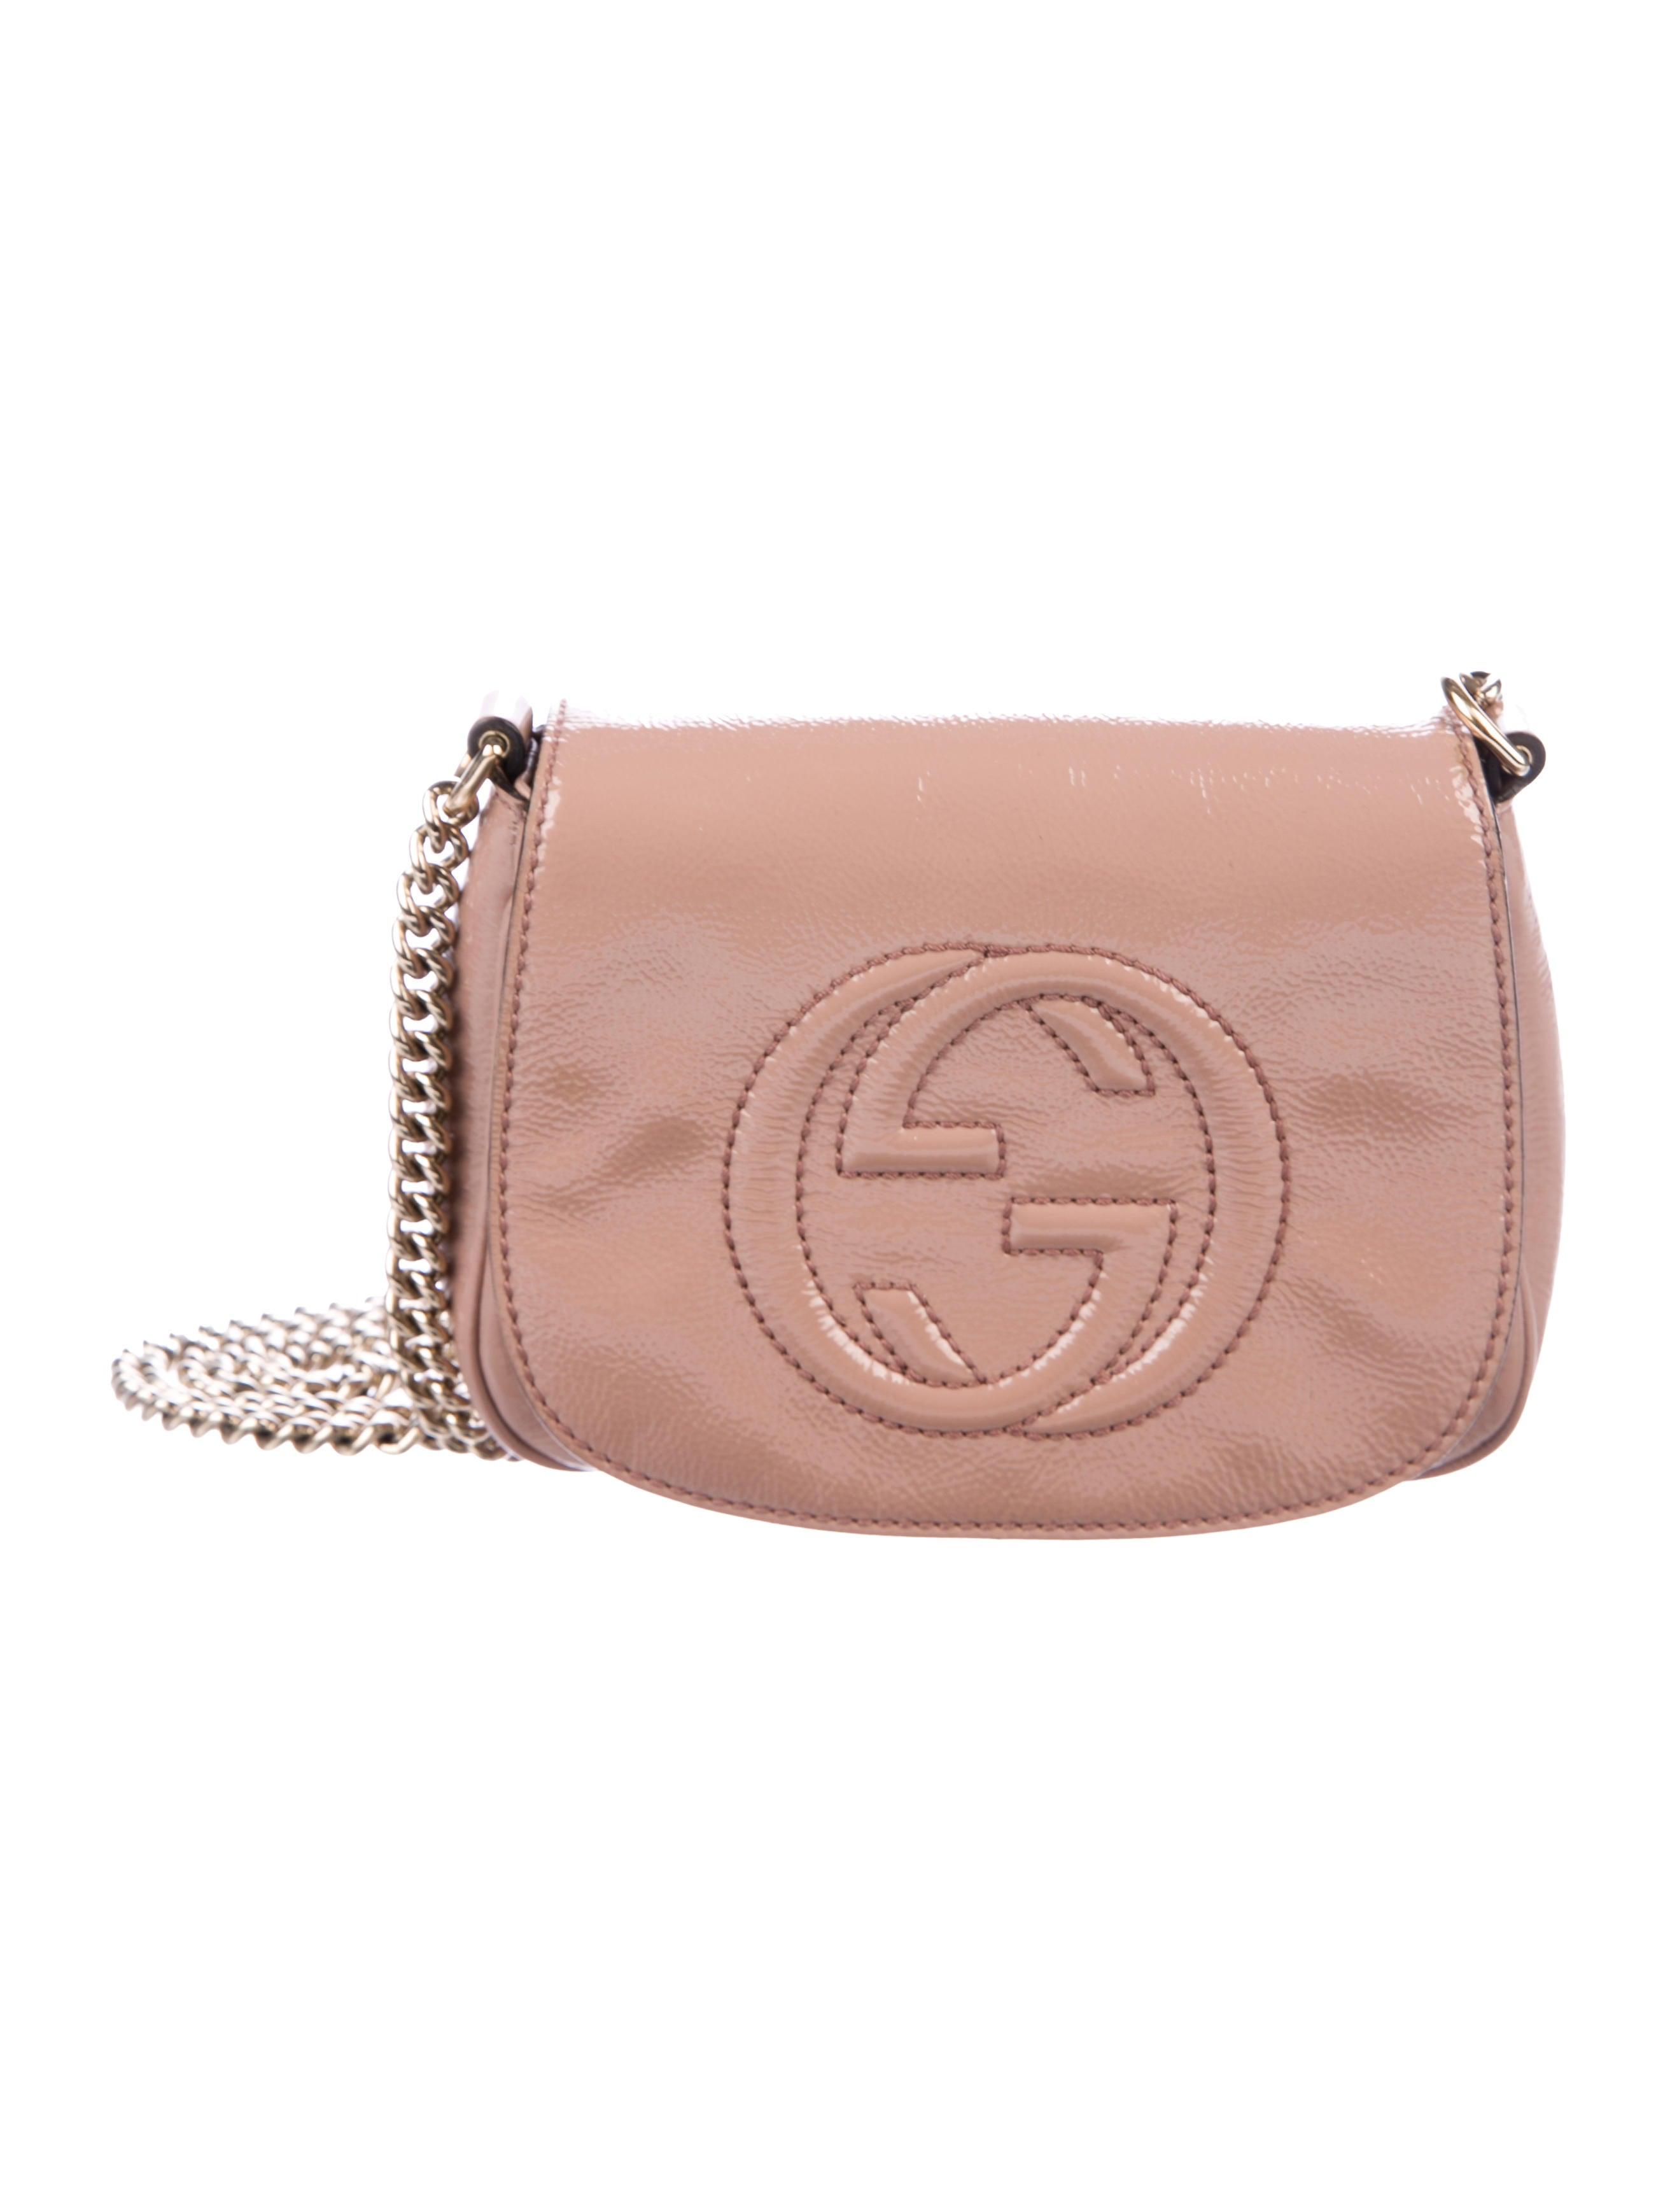 89b1ec9e5c38 Gucci Patent Soho Chain Crossbody Bag - Handbags - GUC226821 | The ...